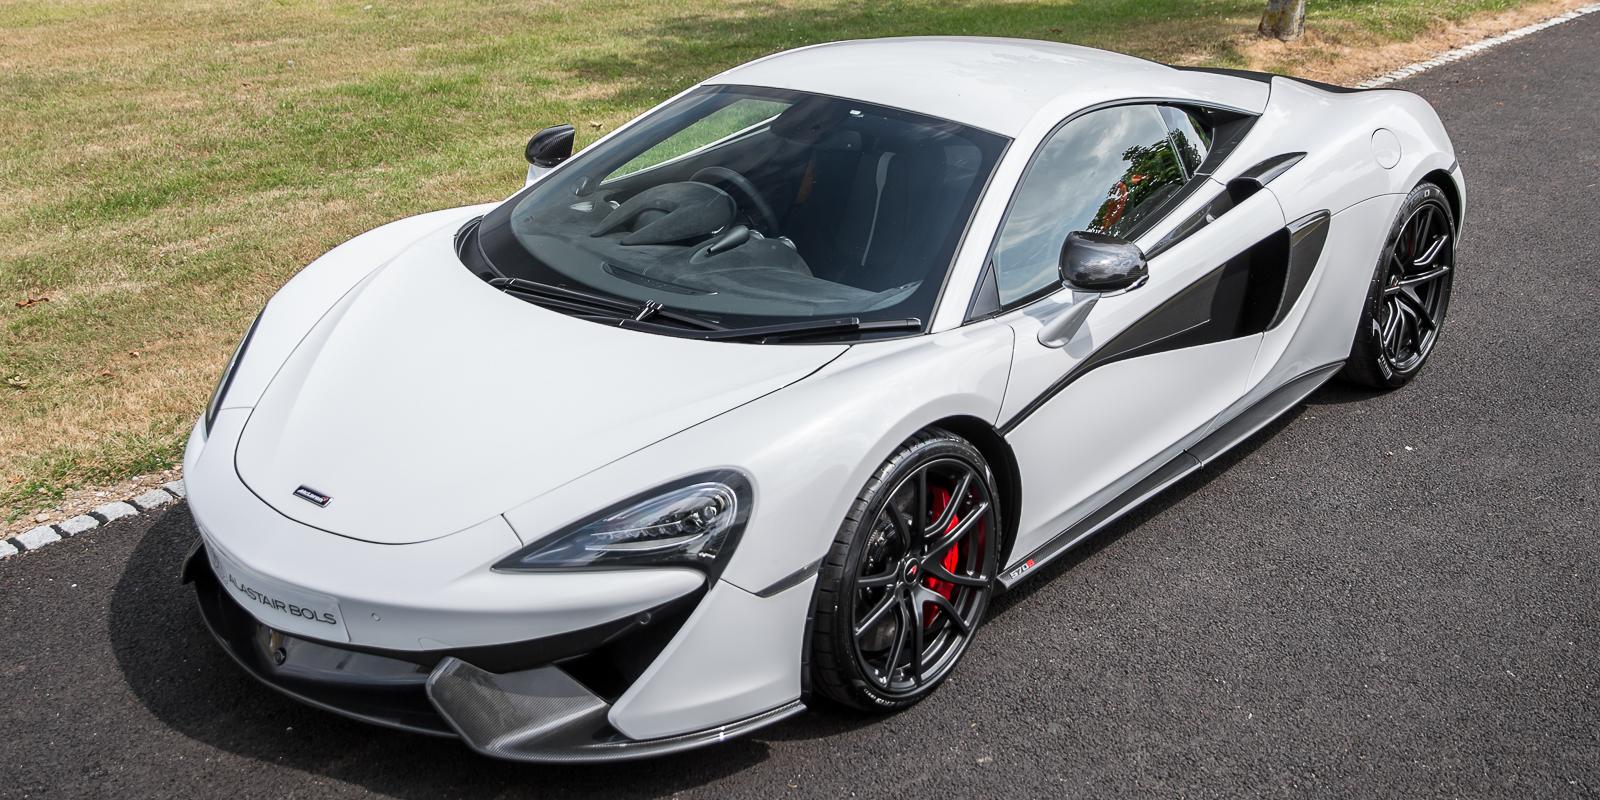 McLaren 570S in Silica White